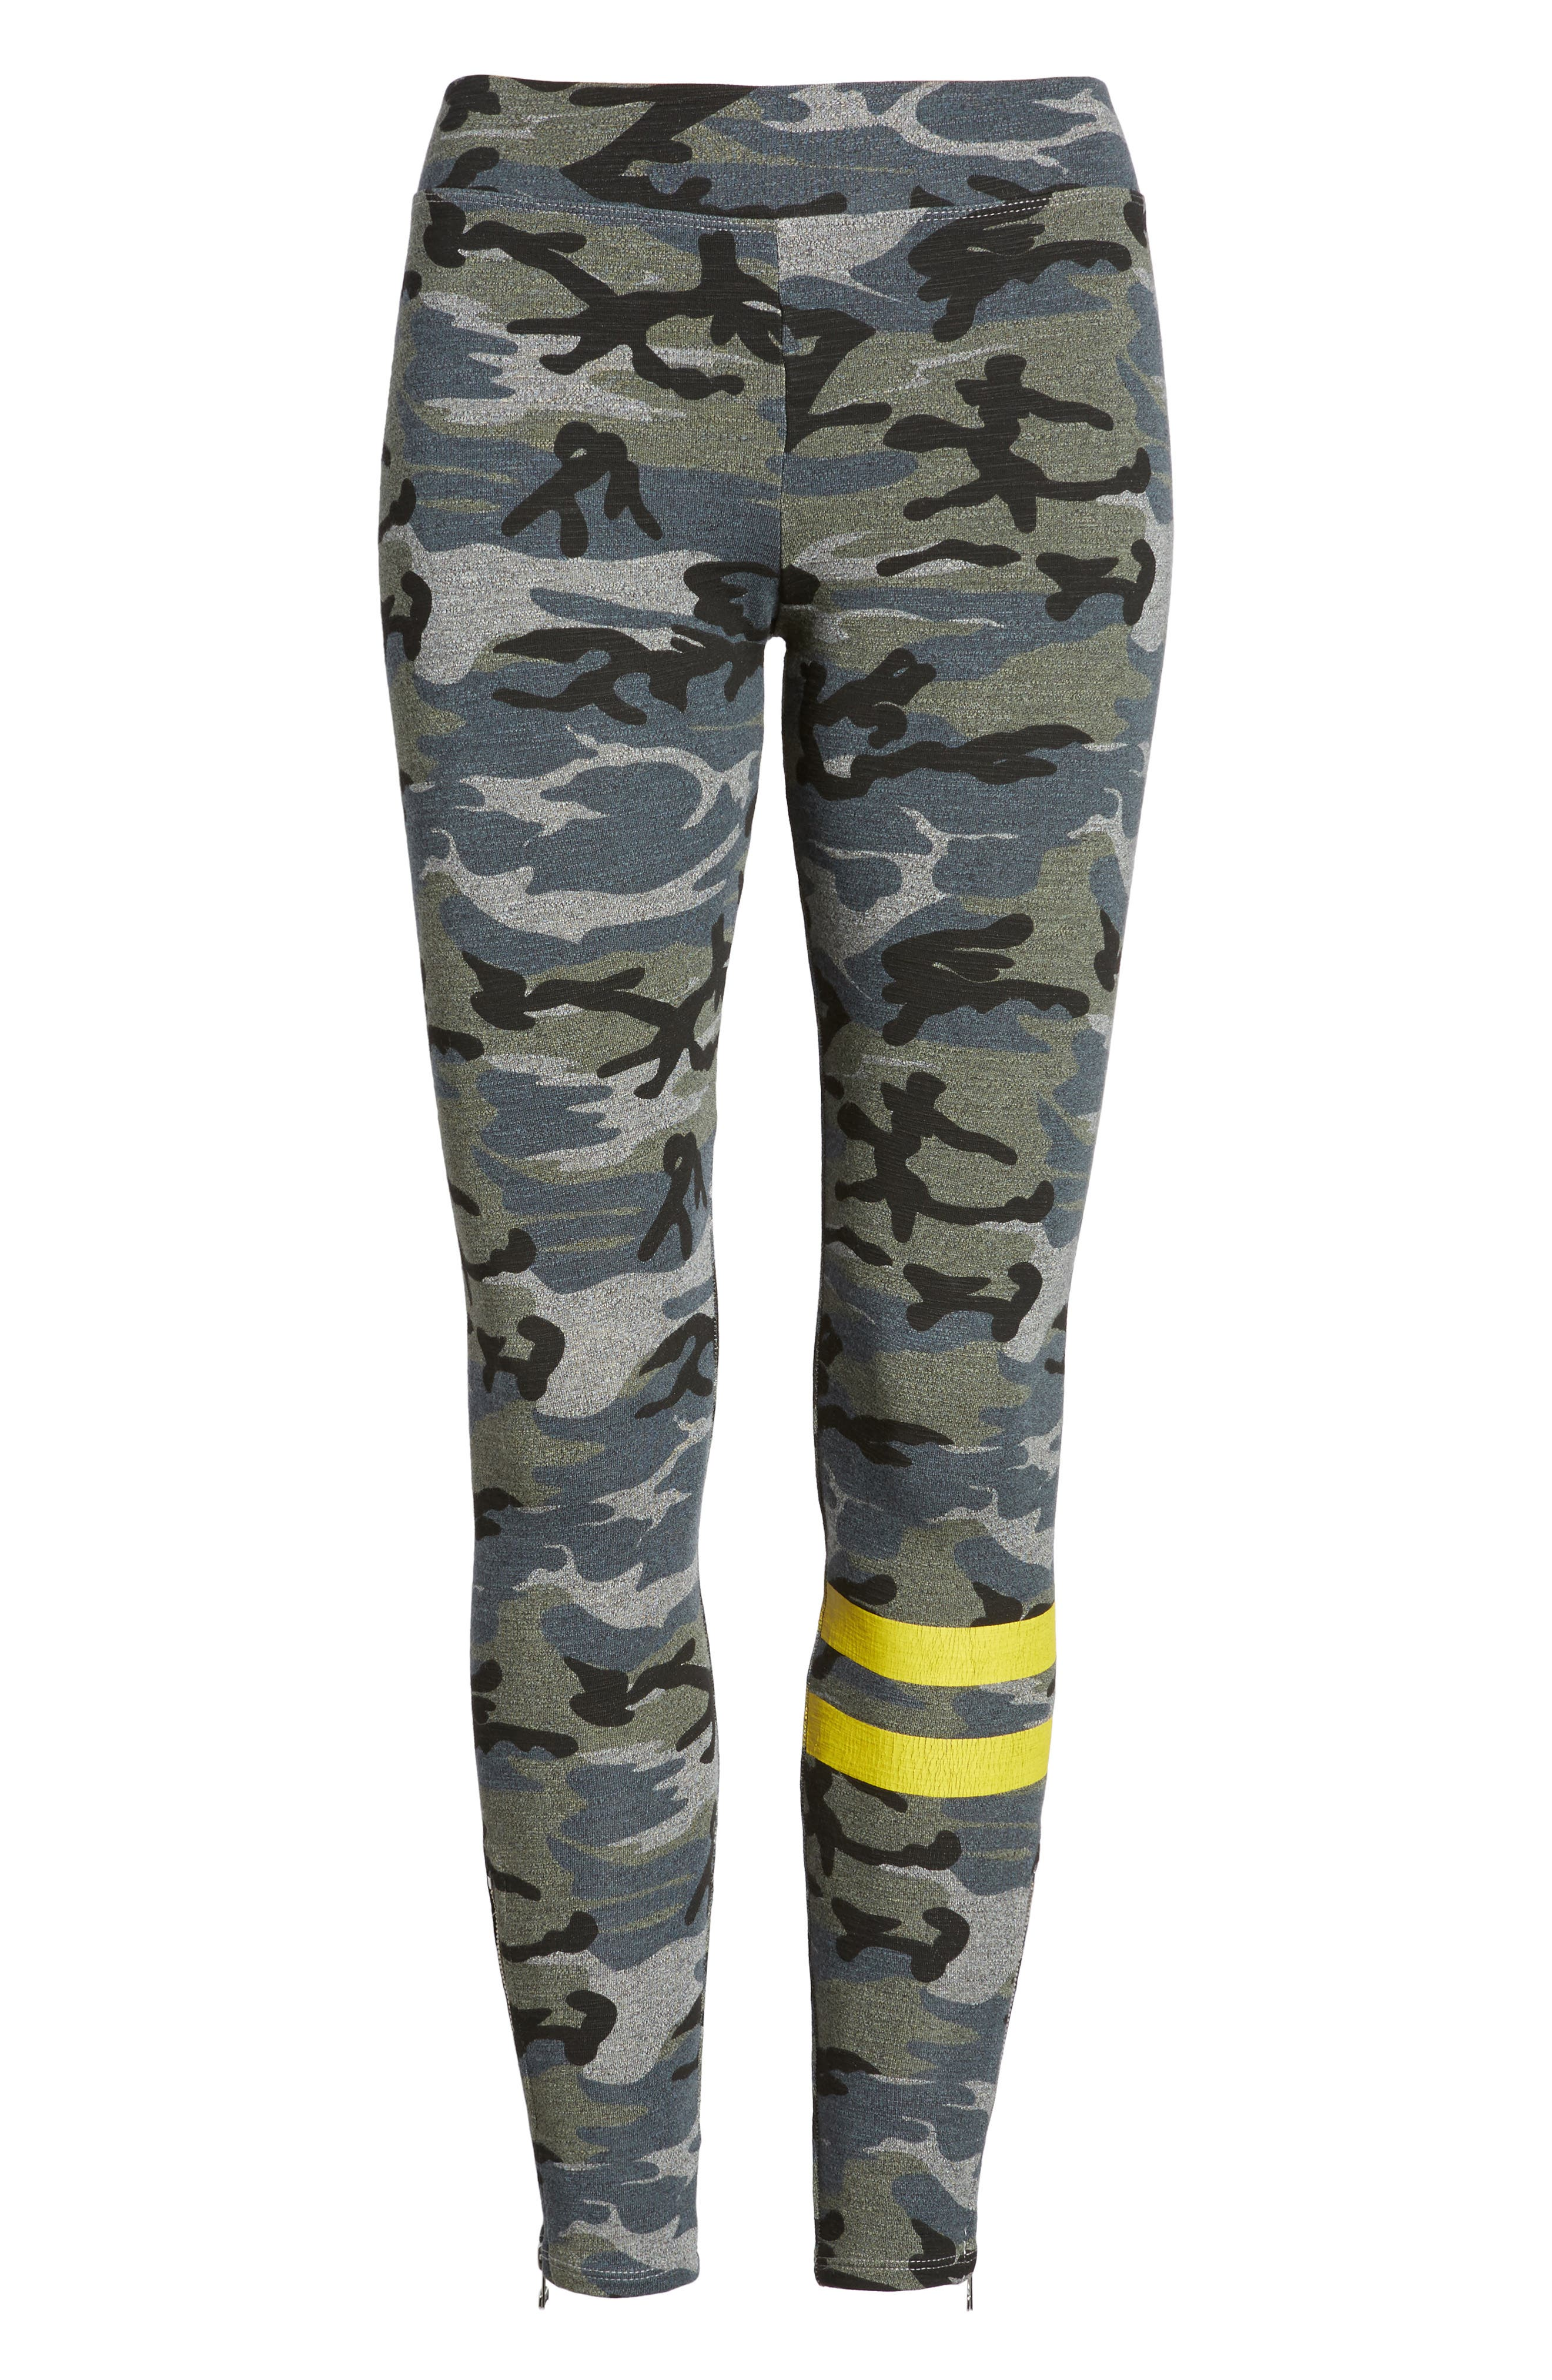 Stripe Camo Yoga Pants,                             Alternate thumbnail 7, color,